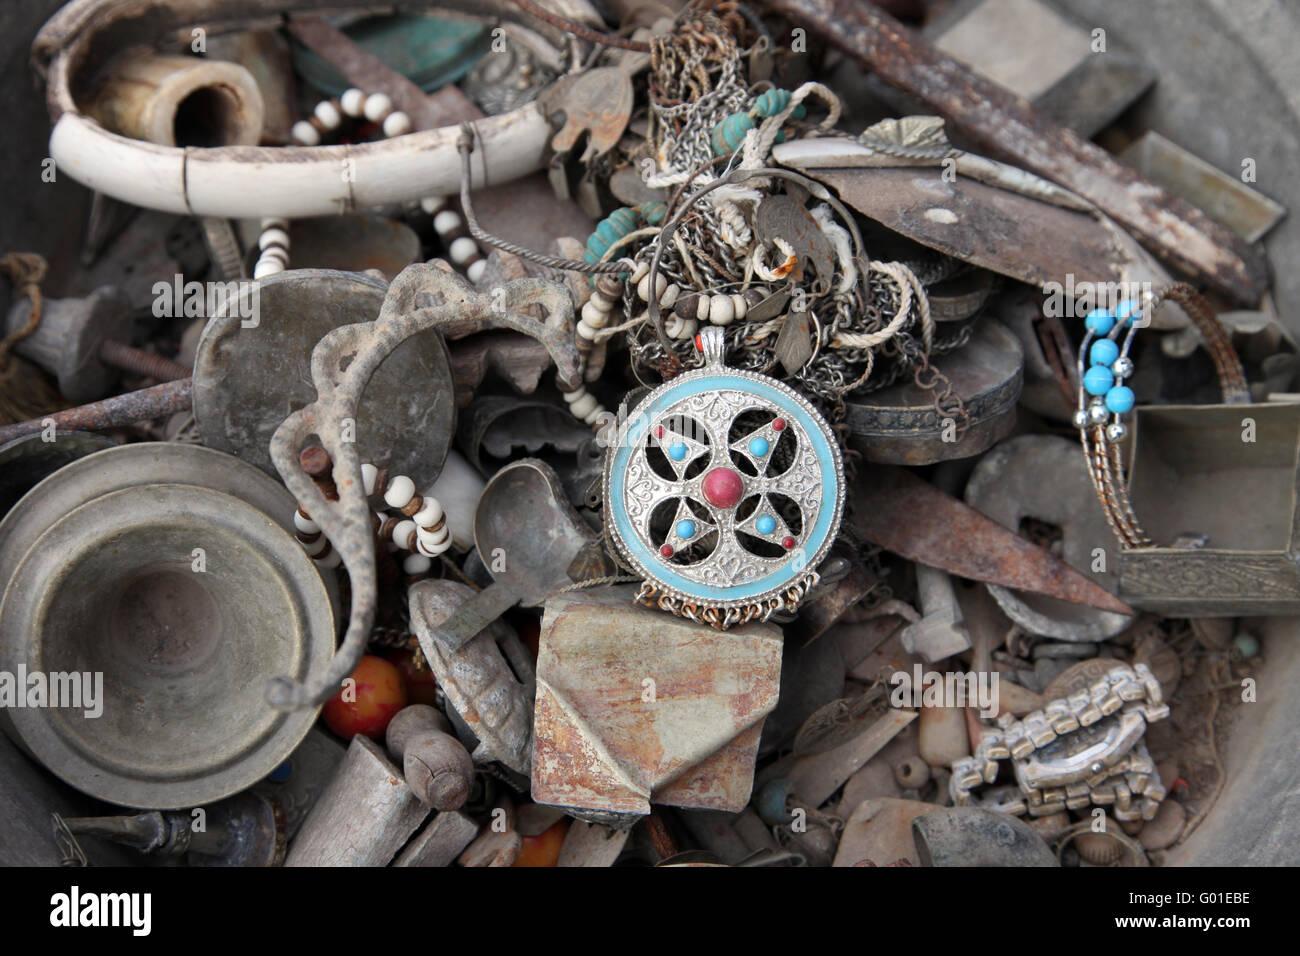 Tunisian antique shop - Stock Image